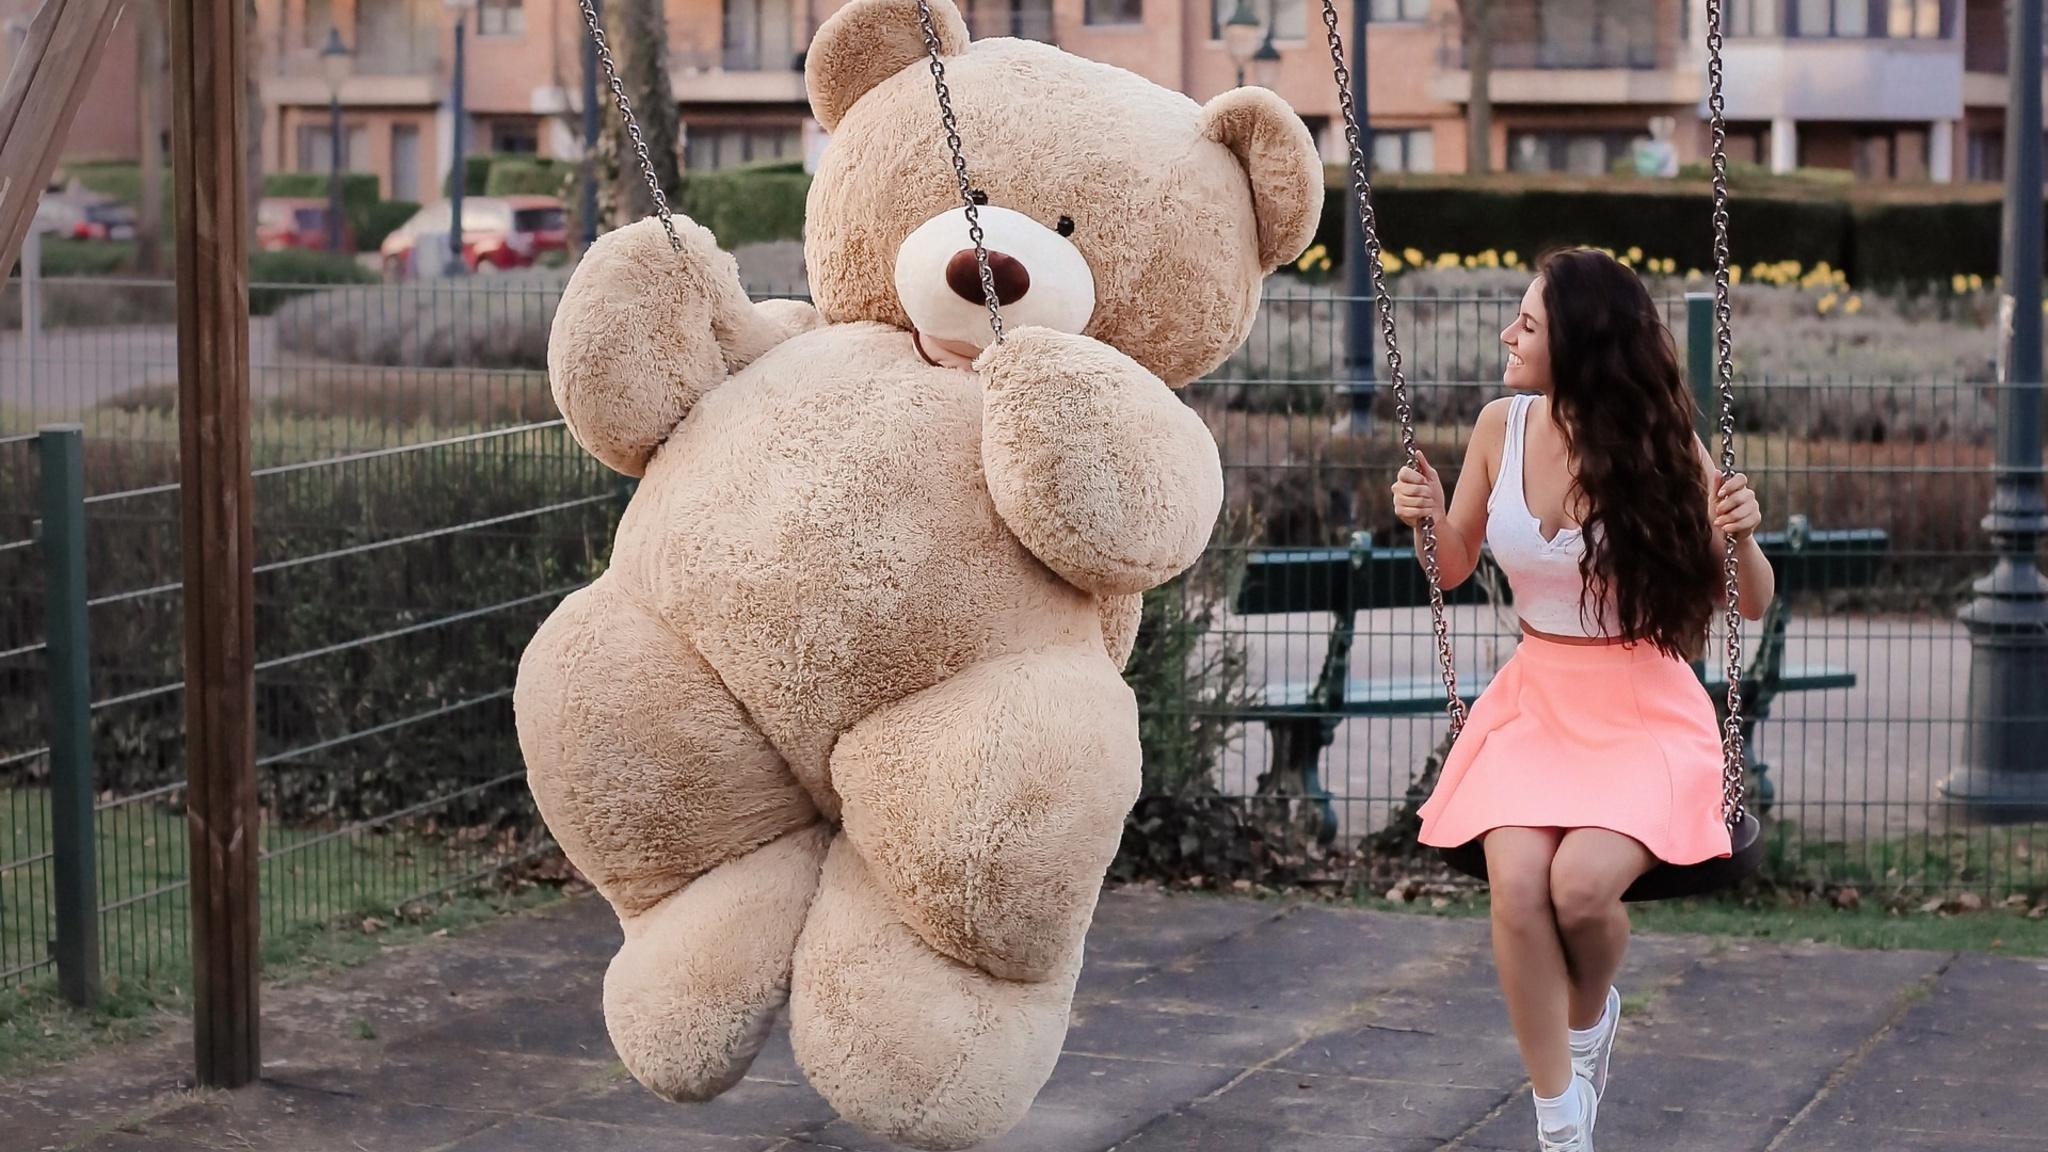 Cute Wallpapers  2048x1152 Girl With Big Teddy Bear On Swing 2048x1152